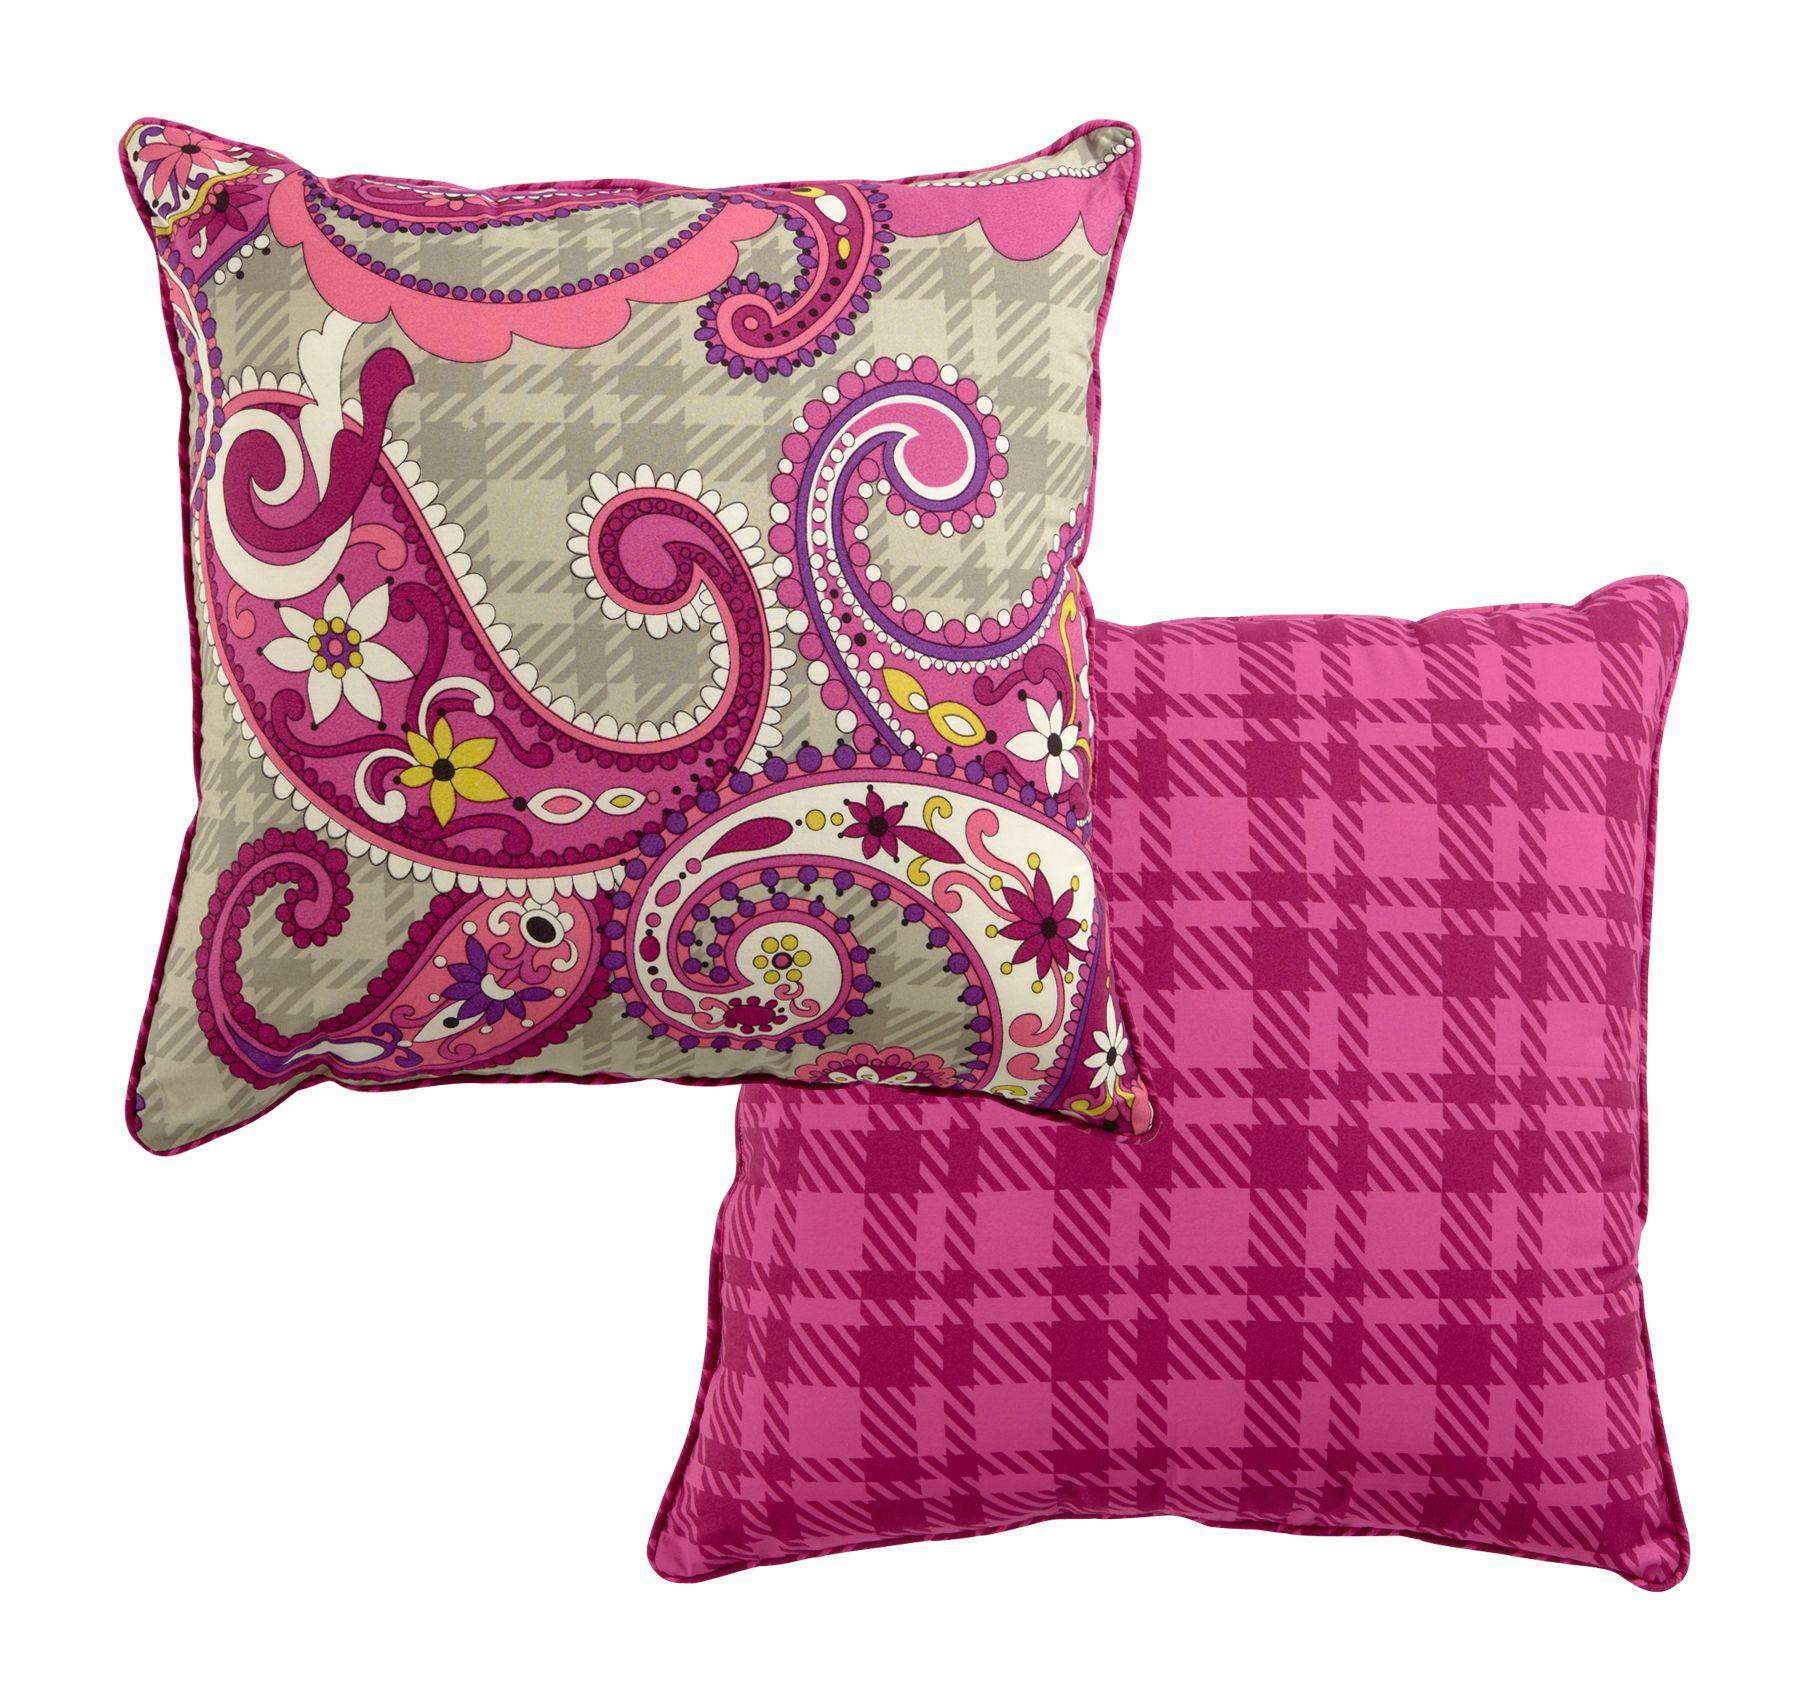 Popular Vera Bradley Reversible Toss Pillow in Paisley Meets Plaid